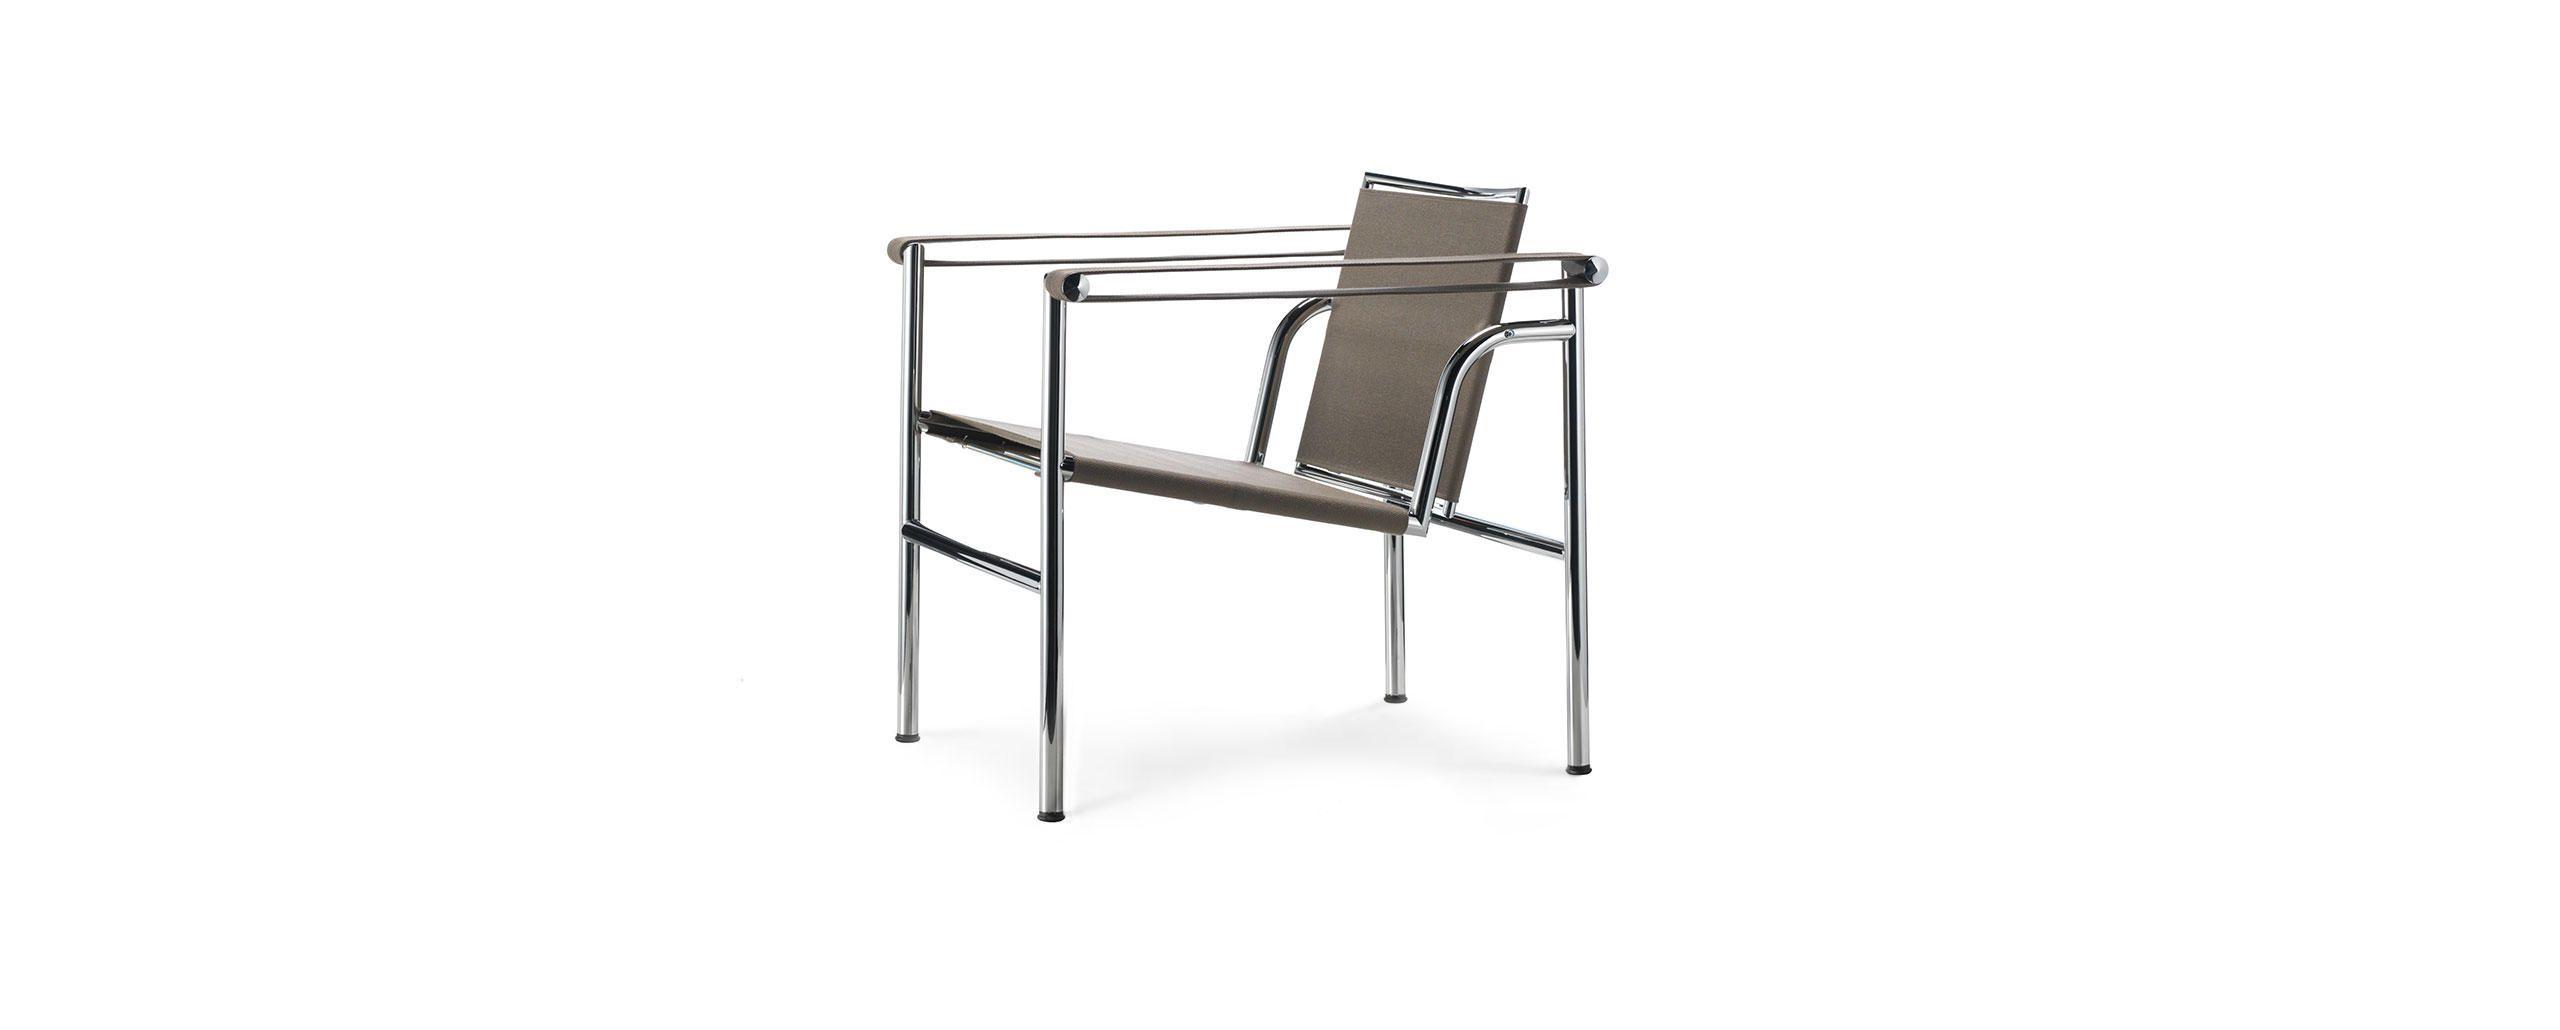 f56e6c10f66bb80d7a61f6d7826ef001 Incroyable De Table Basse Le Corbusier Concept